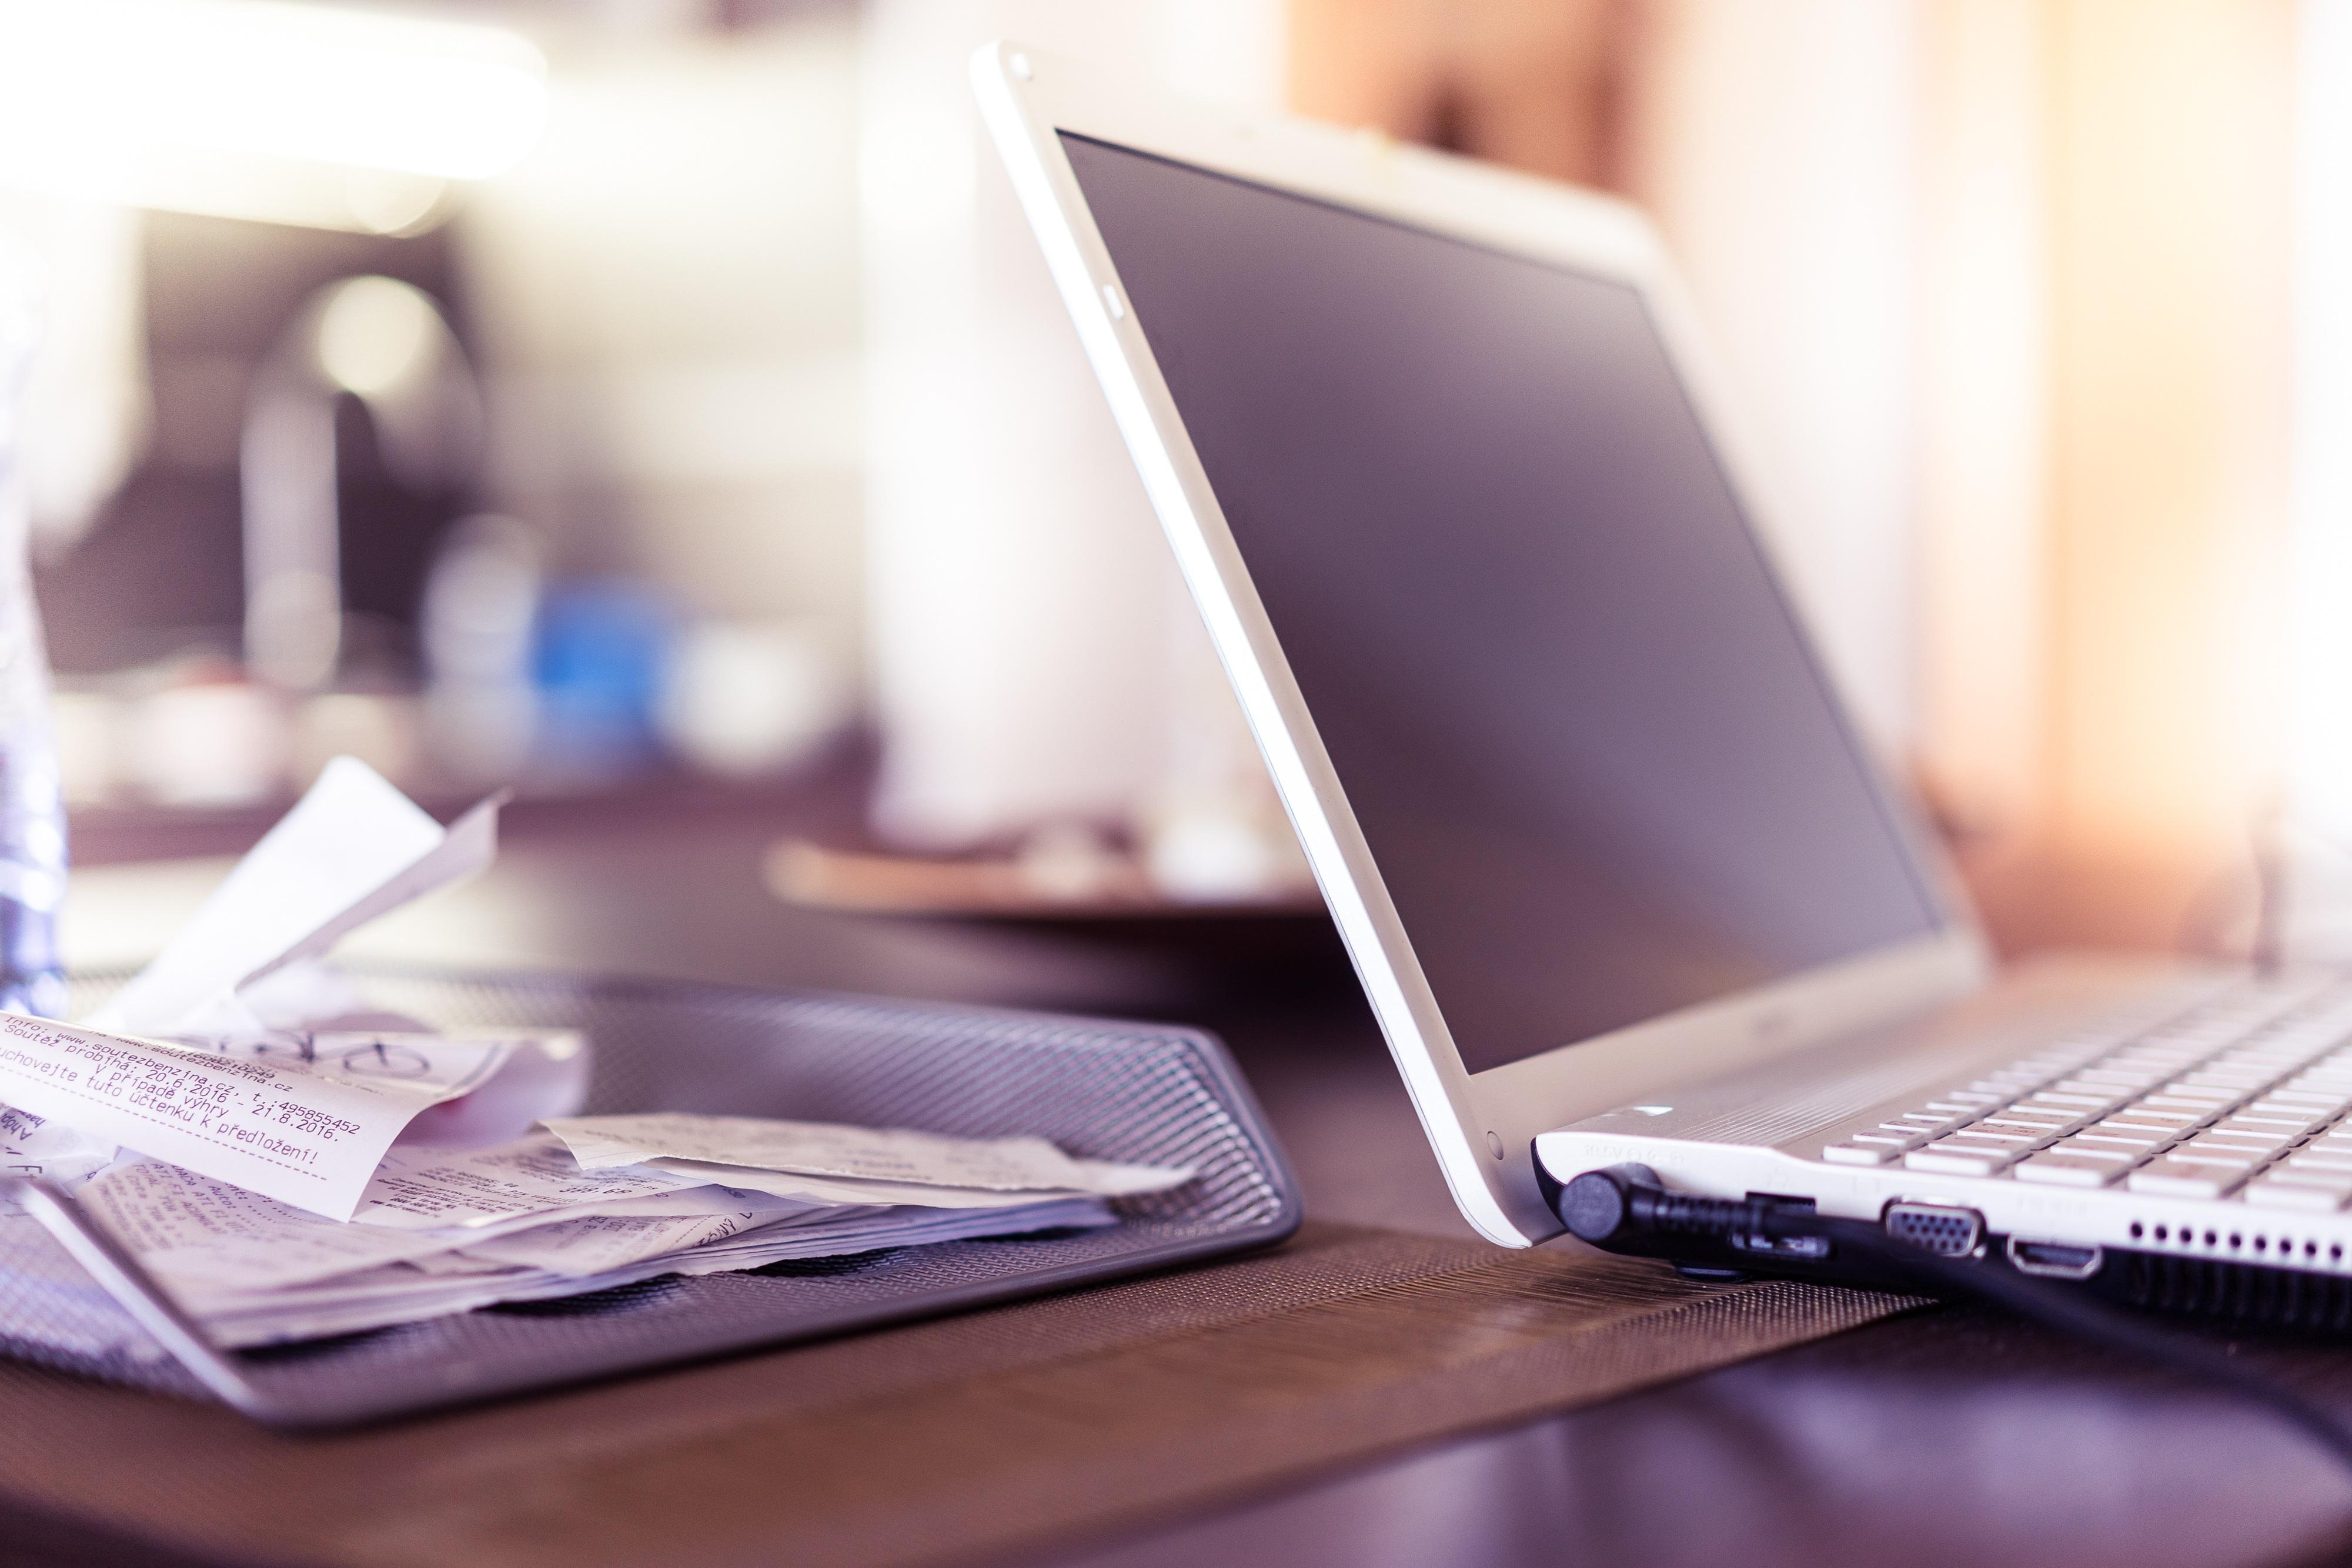 Free Images : laptop, desk, writing, keyboard, technology ...